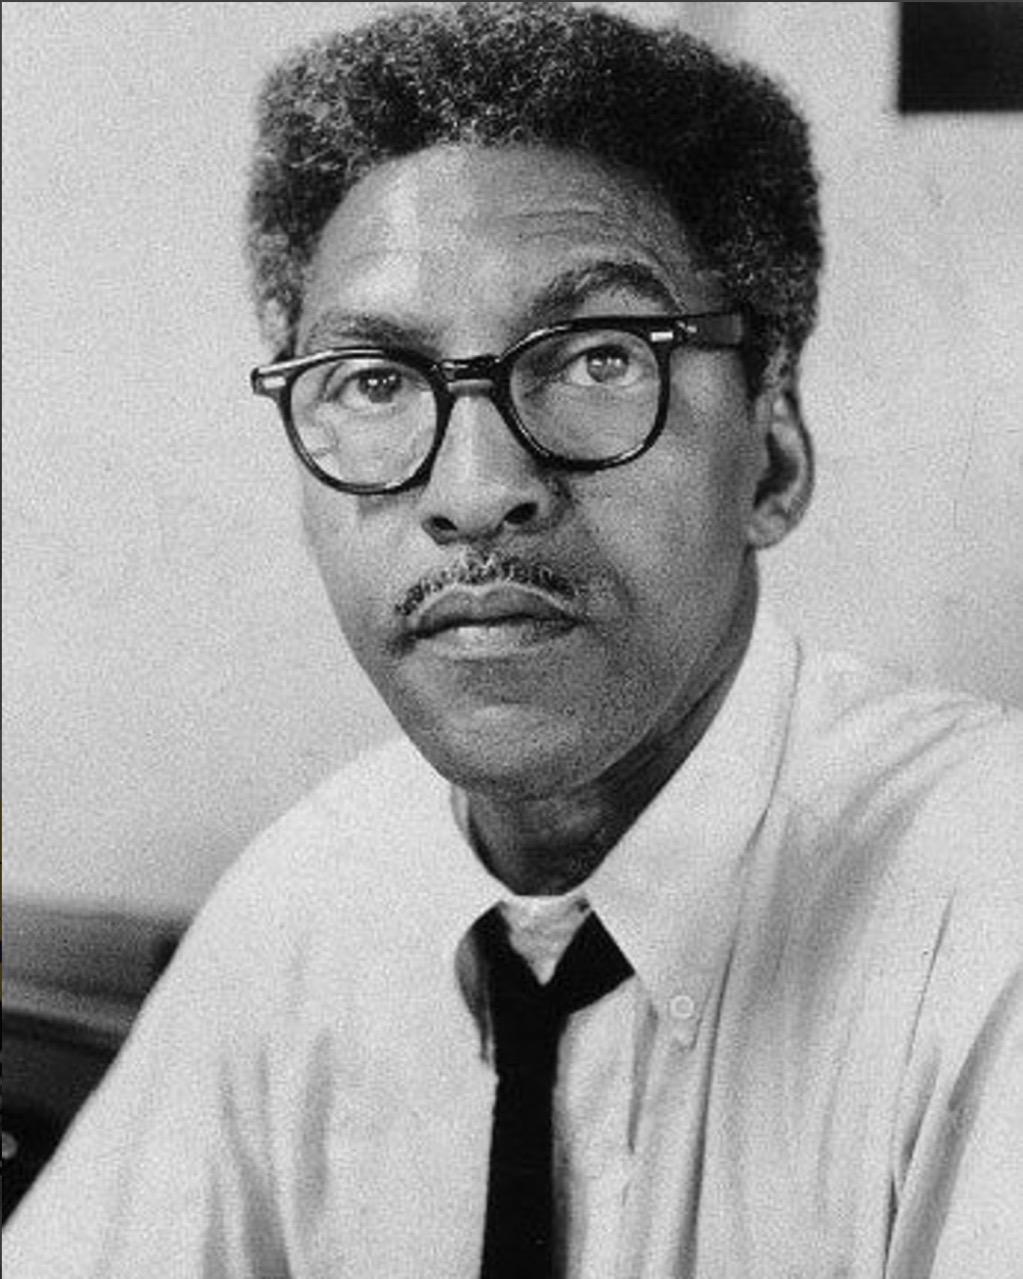 Civil rights hero Bayard Rustin